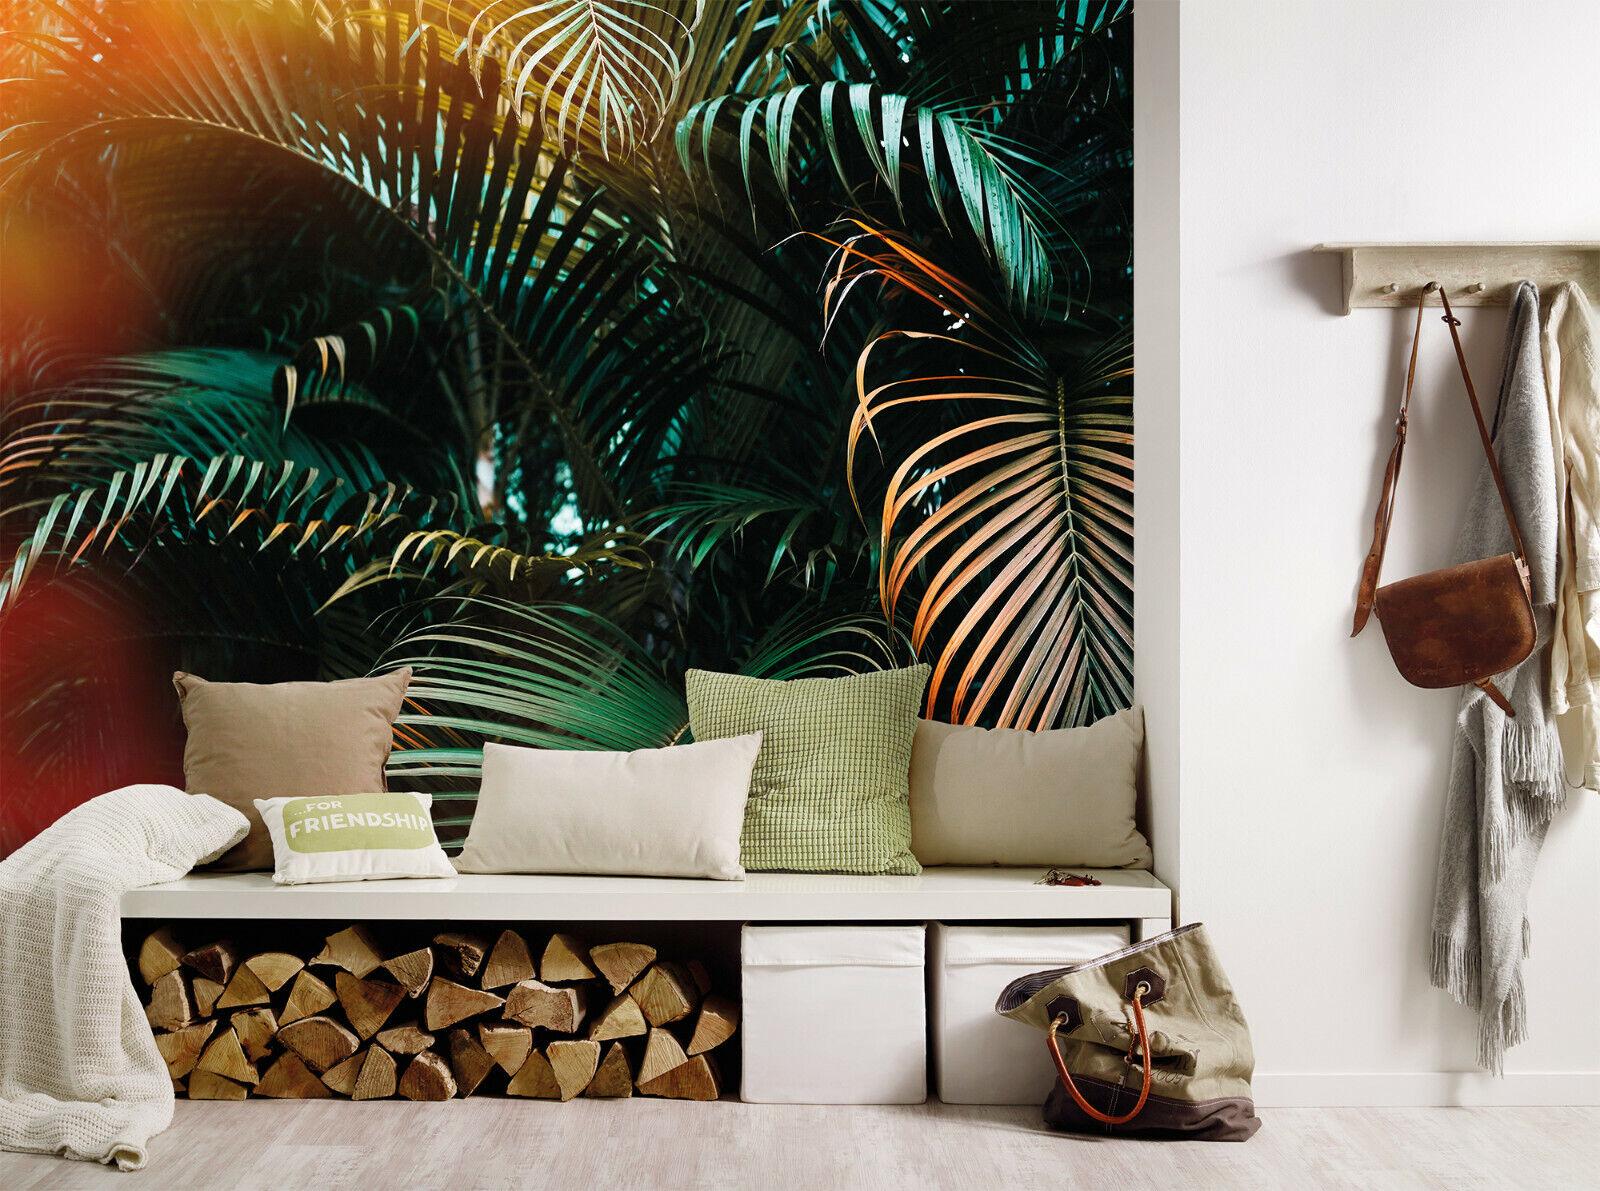 Fototapete Digitaldruck Jungle Color Dschungel Farben 255 X 350 Cm Dd118795 Kaufen Bei Joratrend E K